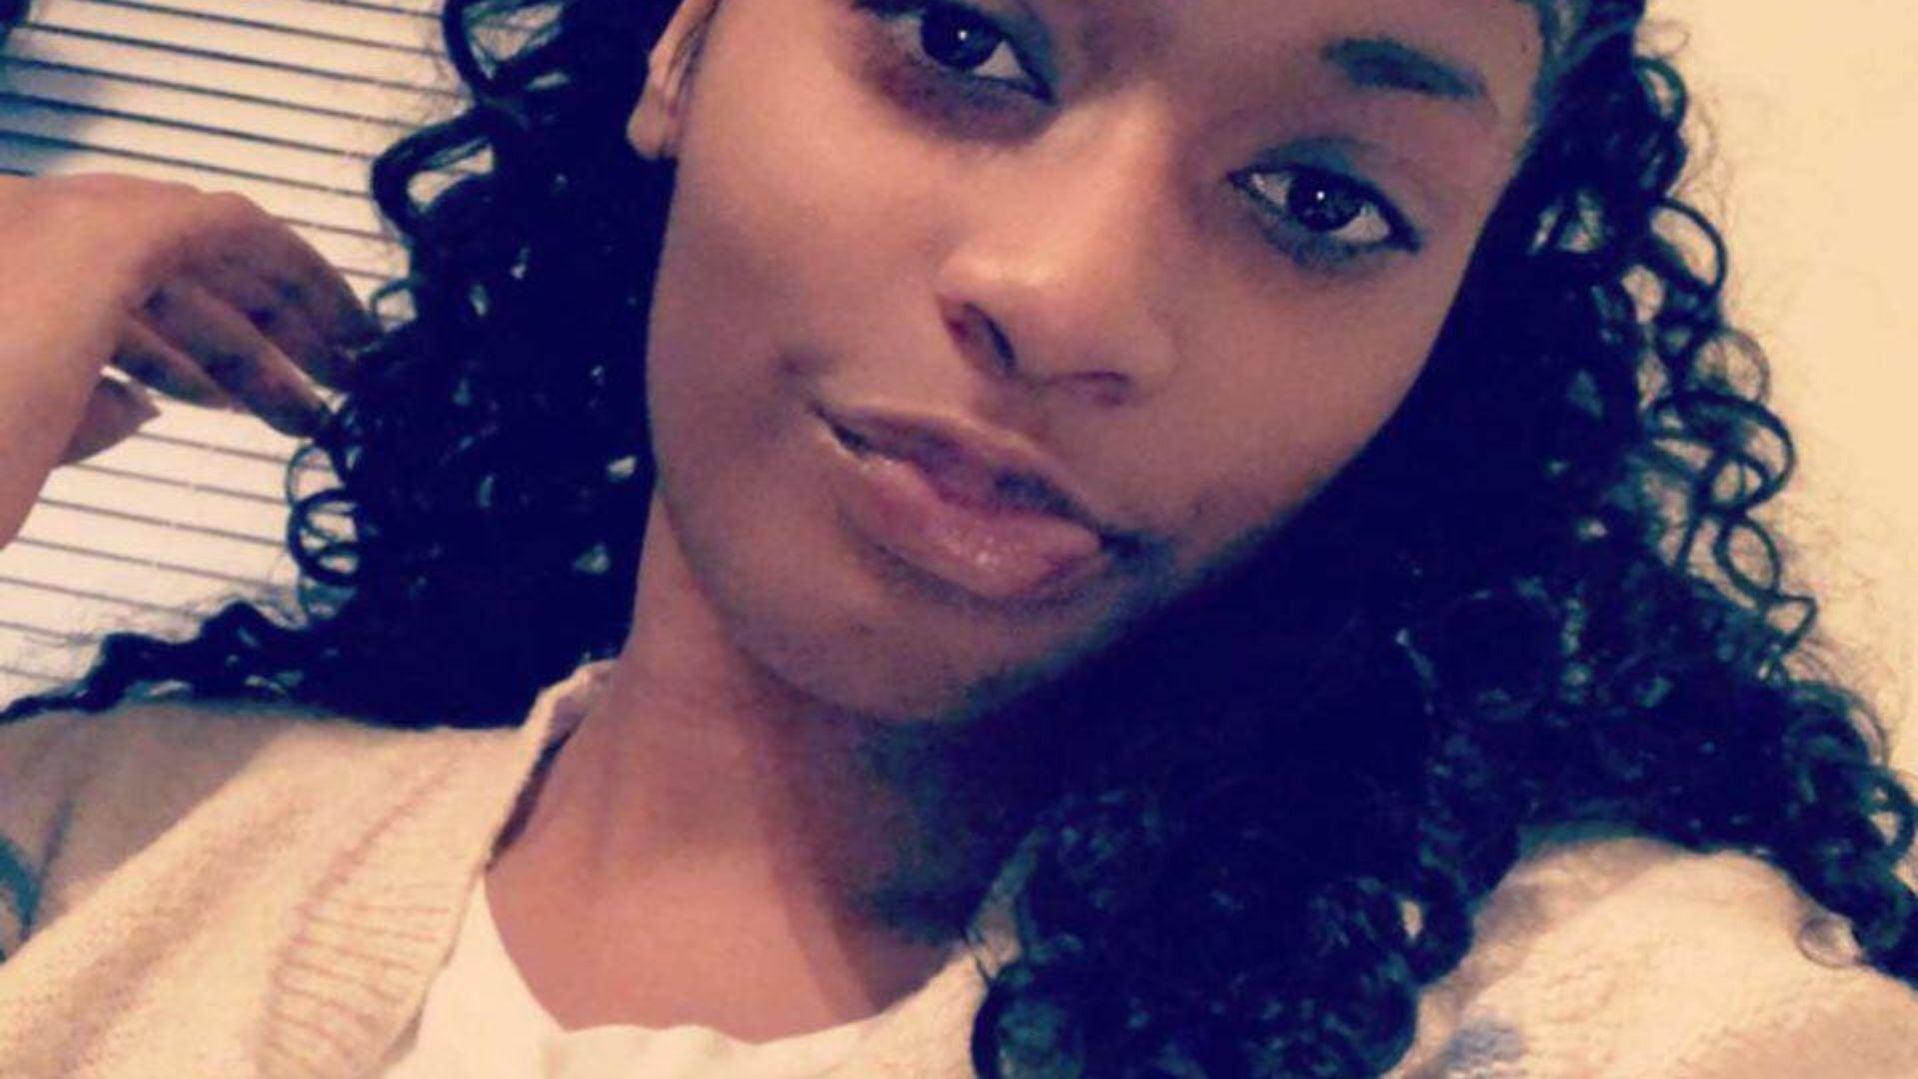 Michigan Woman Filmed Boyfriend Prepping Gun Before He Killed Her, Authorities Say